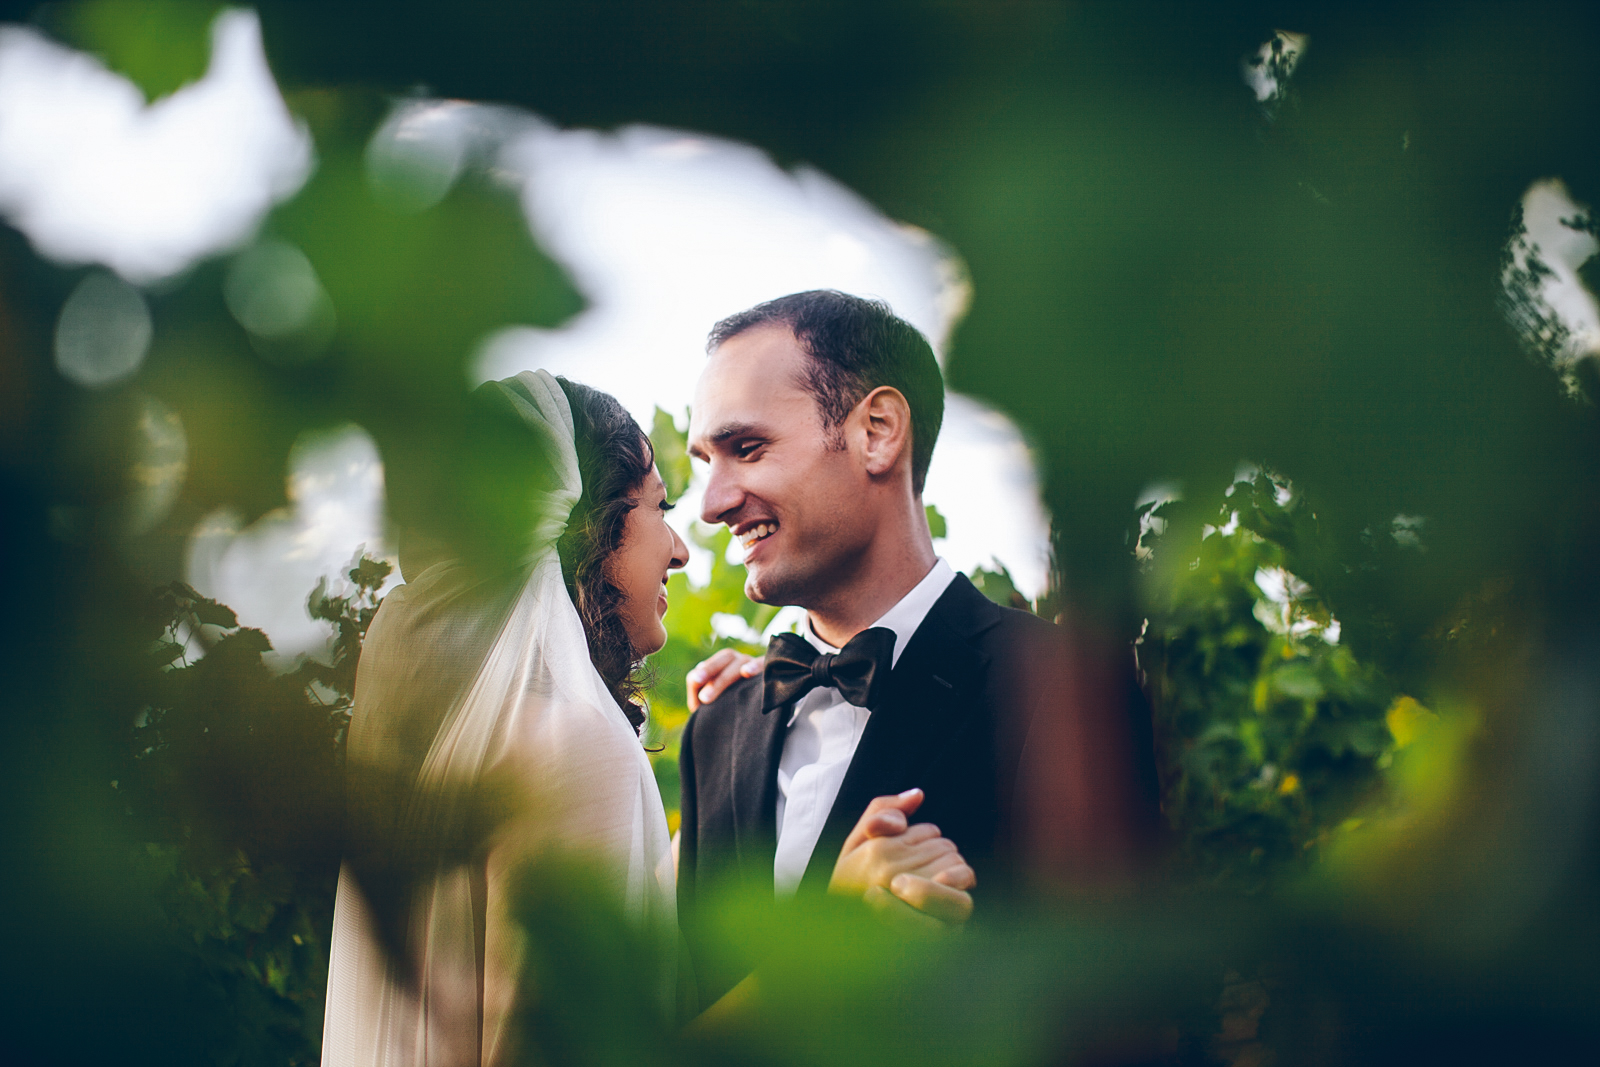 miraflores_winery_wedding_photography_ian_melissa_ebony_siovhan_bokeh_photography_58.jpg